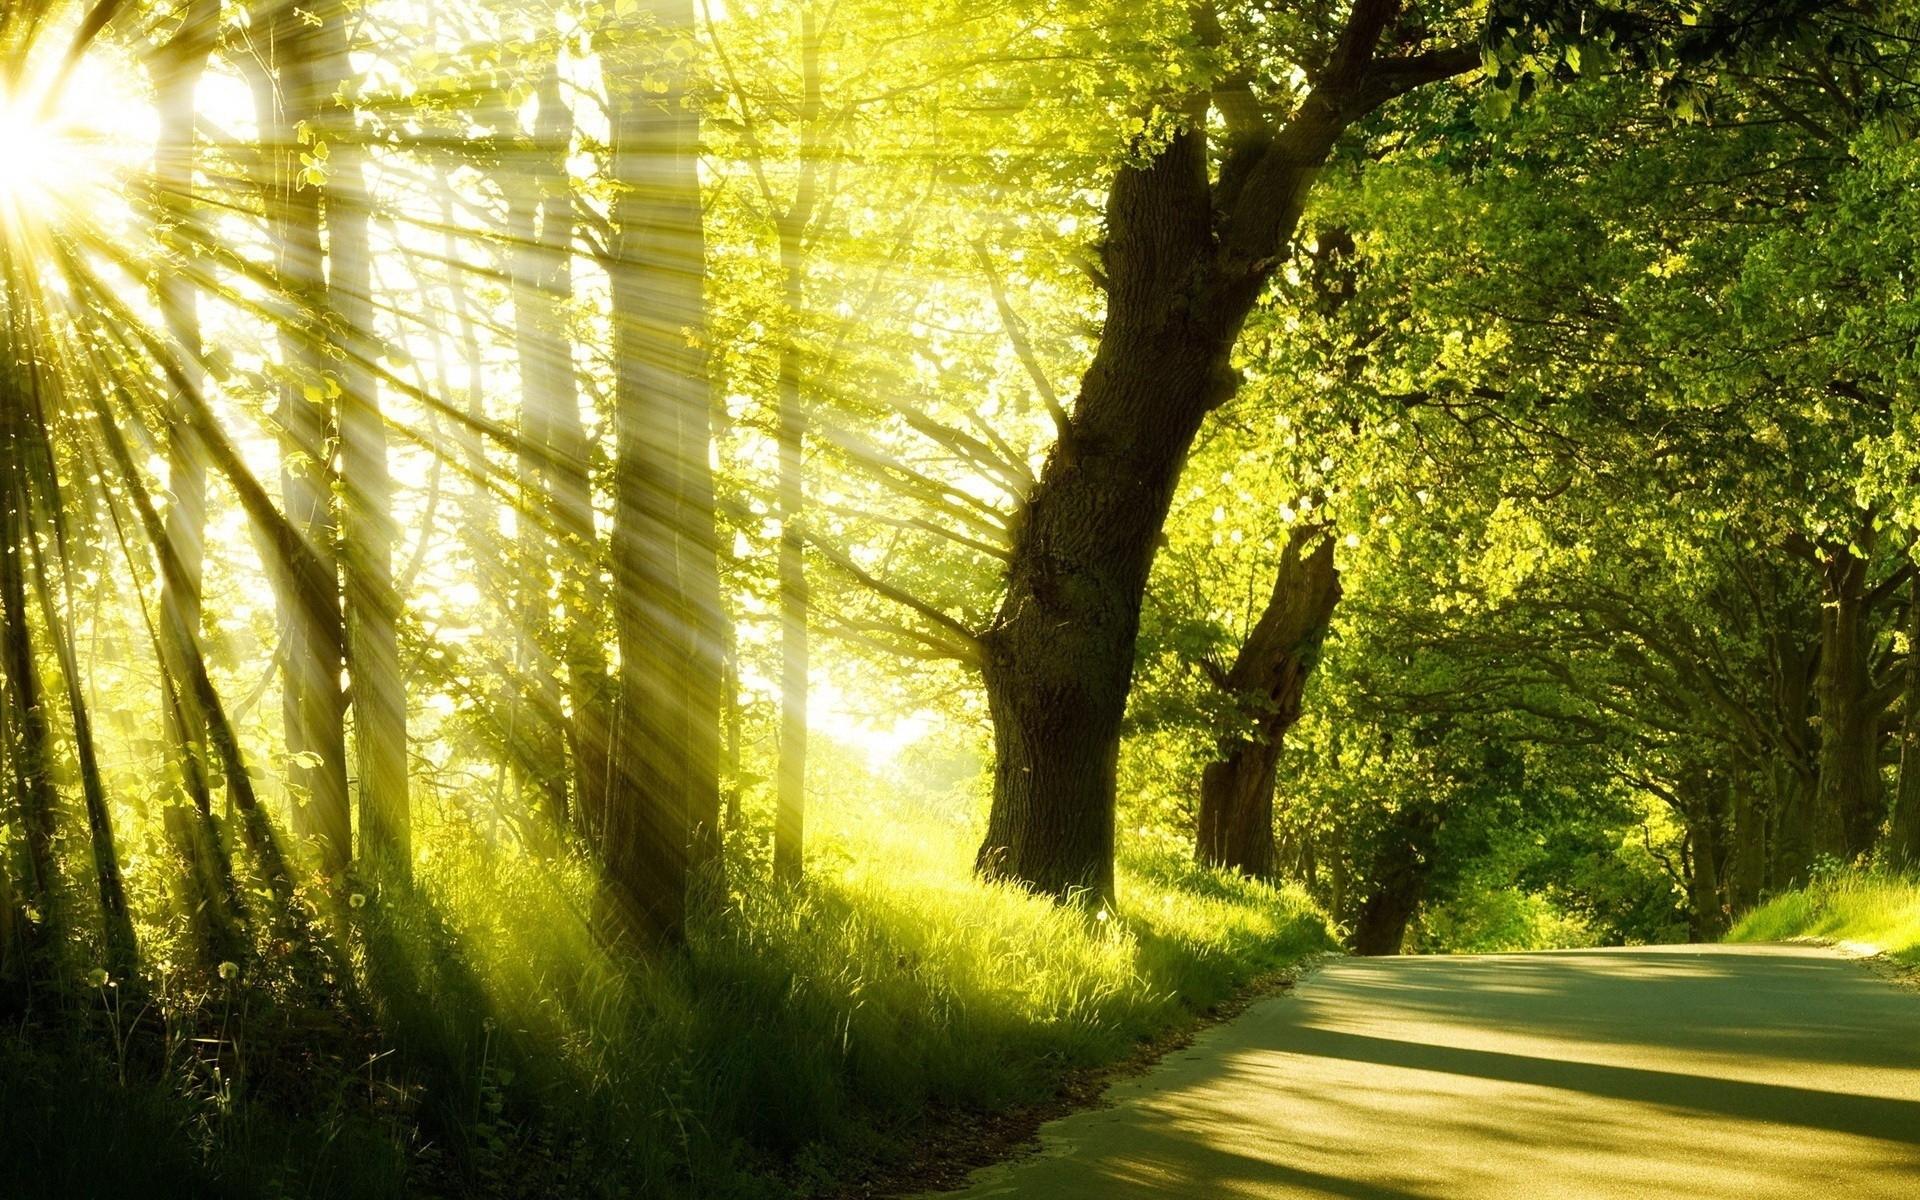 Download mobile wallpaper Sun, Trees, Landscape for free.